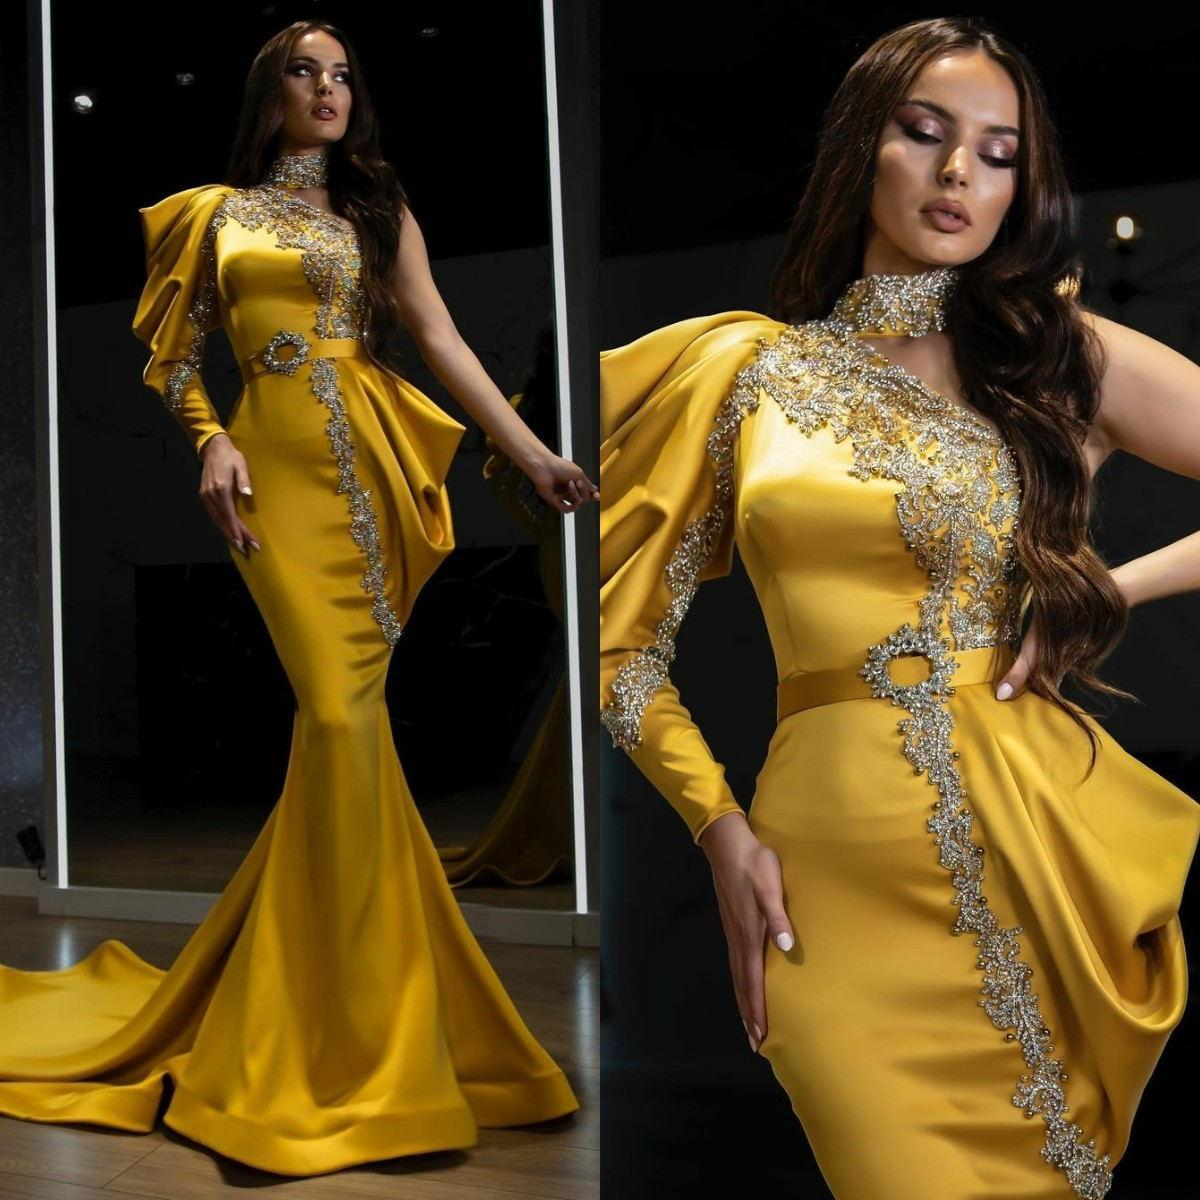 Elegant Satin Mermaid Evening Dresses Lace Beaded High Neck Long Sleeve Prom Dress Women Red Carpet Celebrity Gowns